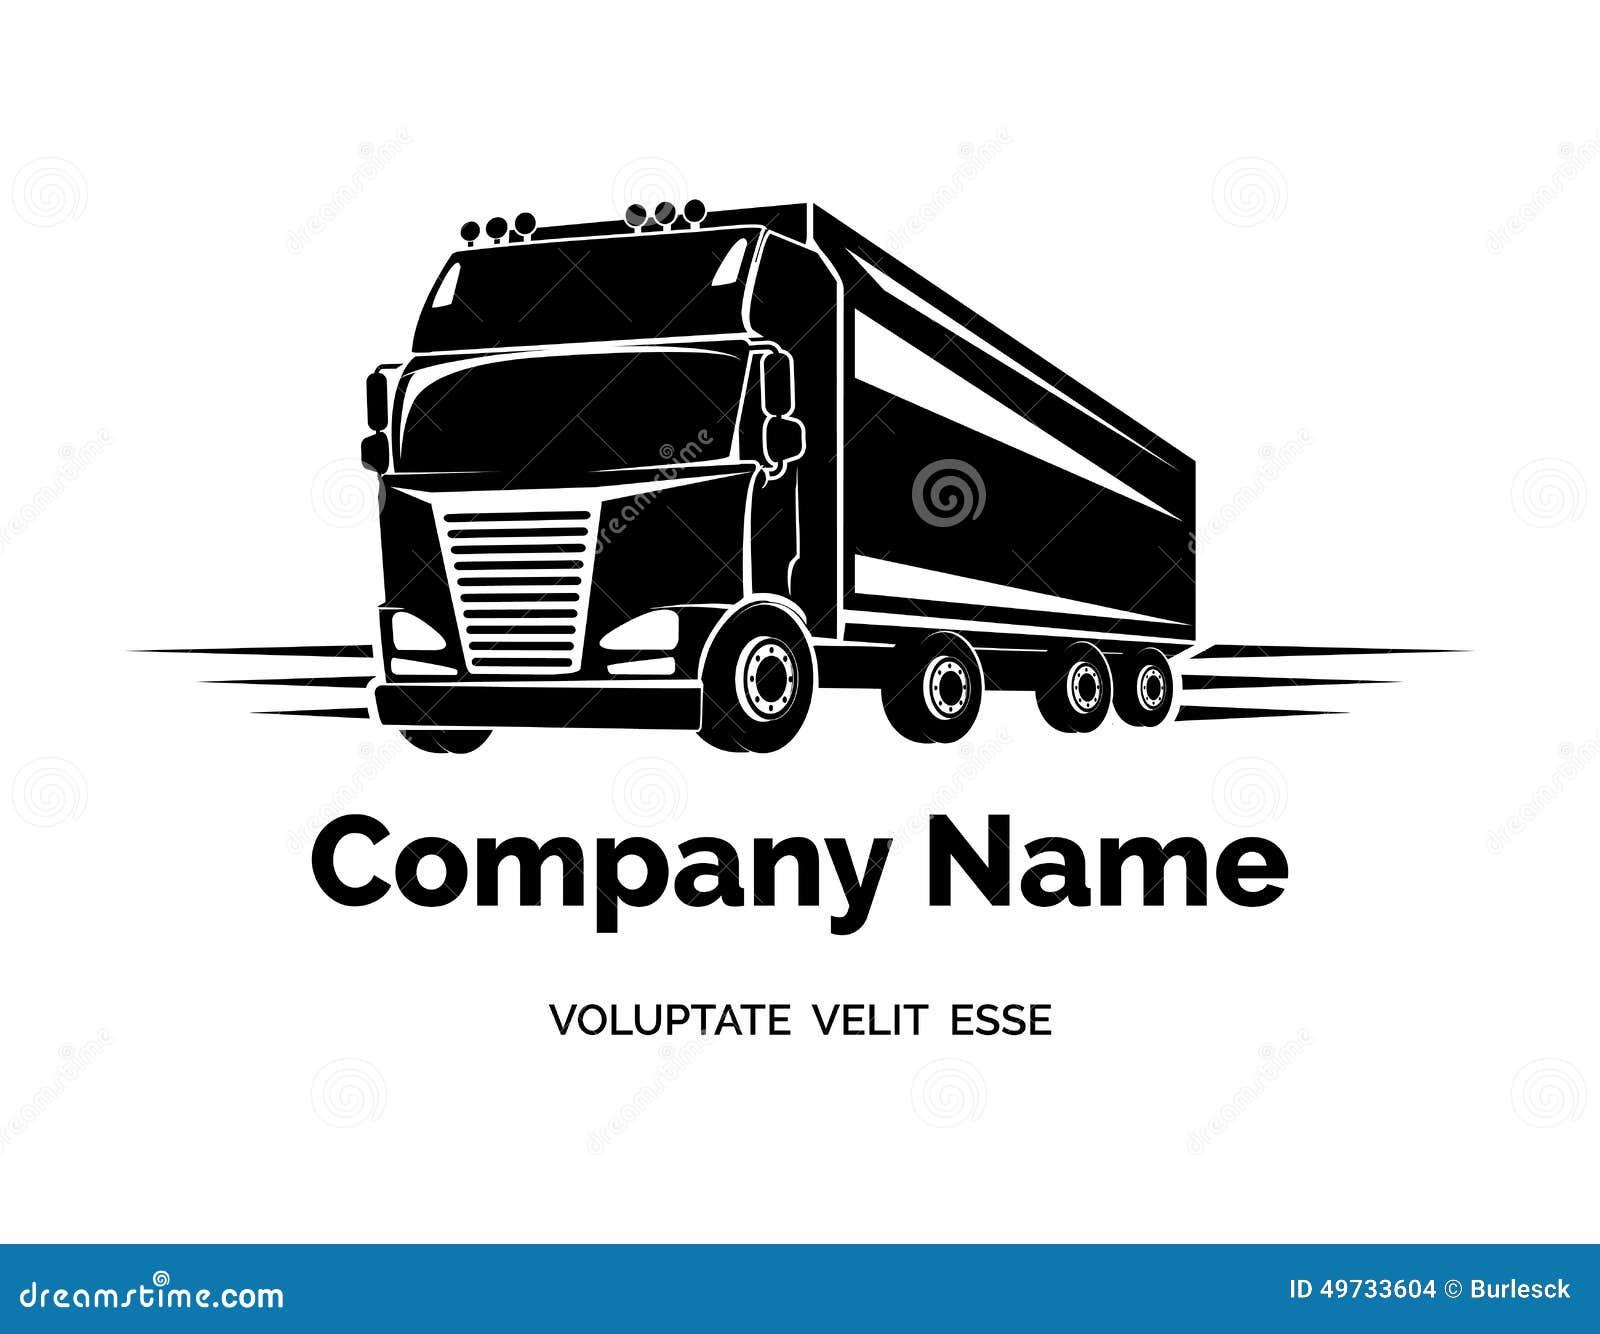 Taco likewise 43445438 in addition Stock Illustration Moving Truck Delivery Road Transportation Design Concept Image46018648 likewise CZ8m 15069 in addition Illustration Stock Logo De Camion De Cargaison De Vecteur Image49733604. on truck illustration